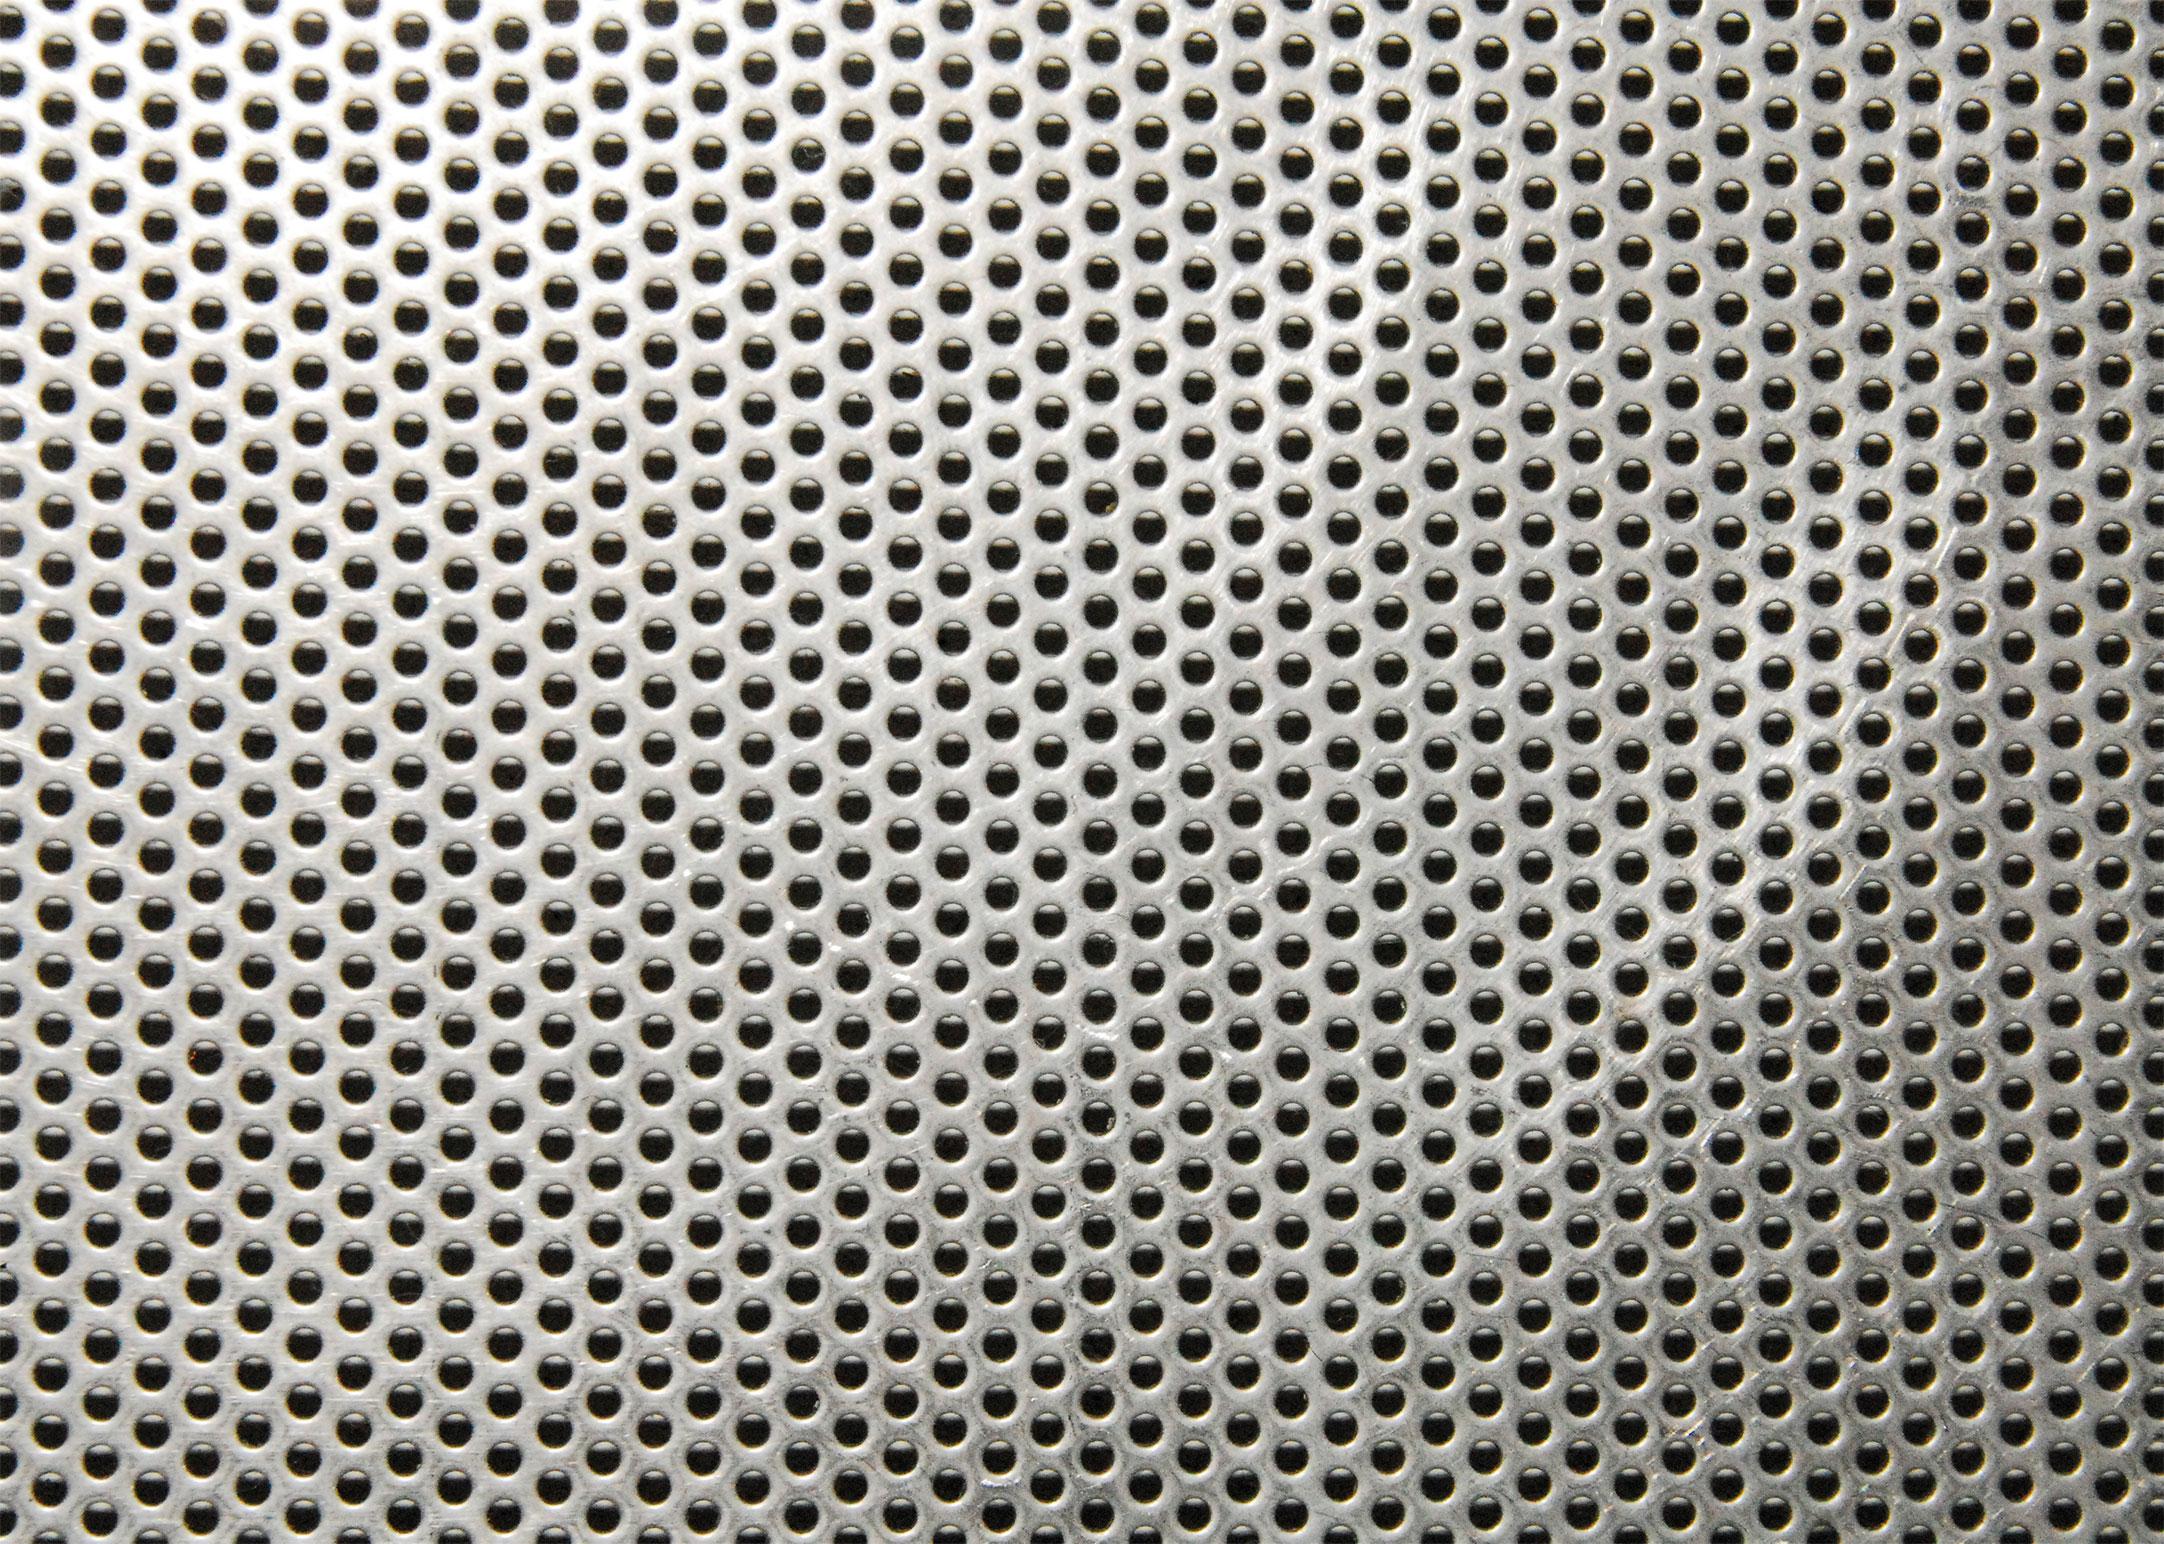 Groom-X Bath Grid Stainless Steel 80x50x3cm